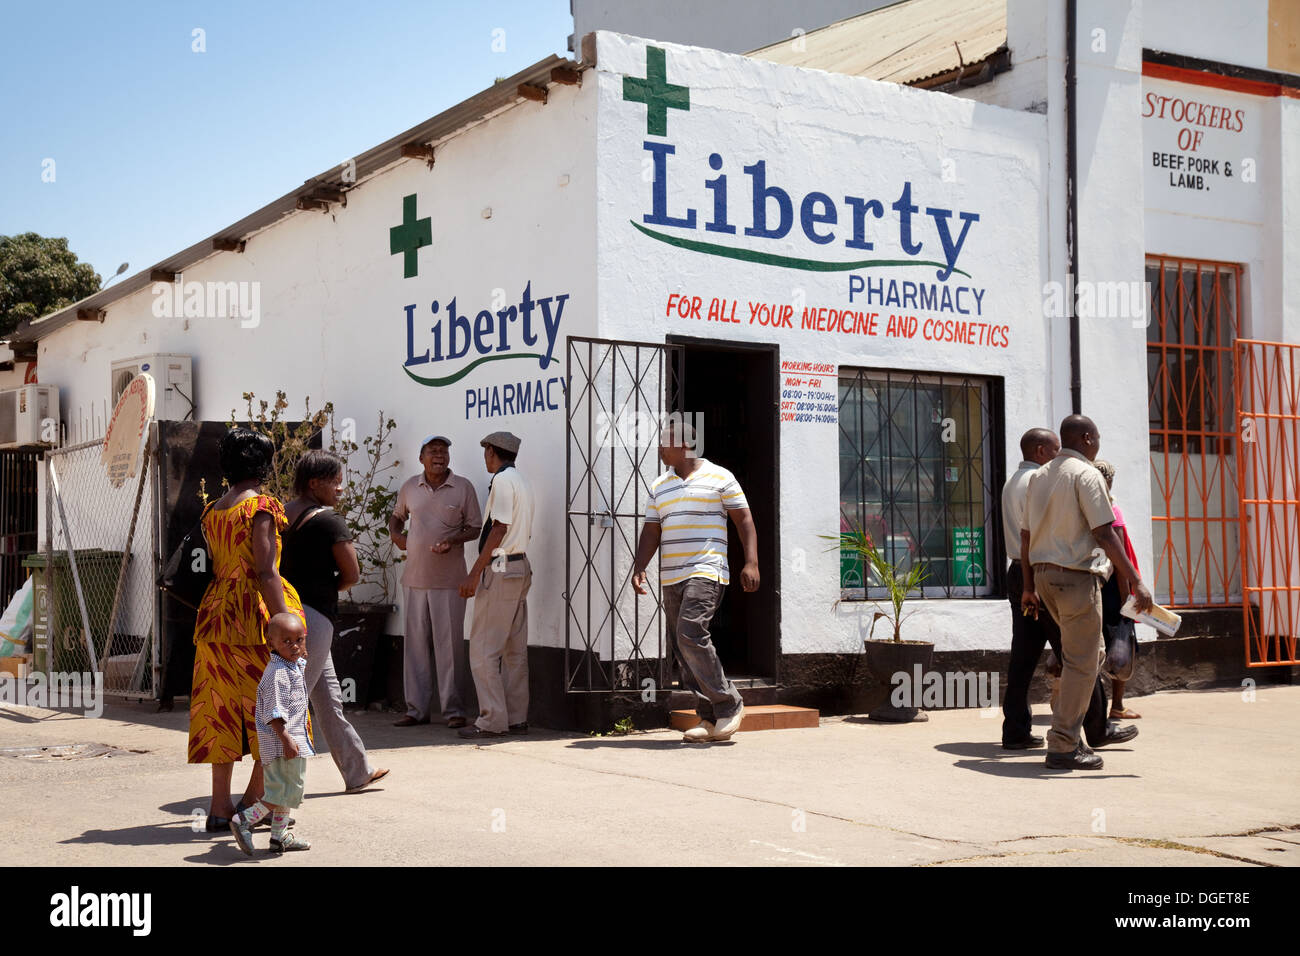 Africa pharmacy chemist shop, Livingstone, Zambia, Africa Stock Photo